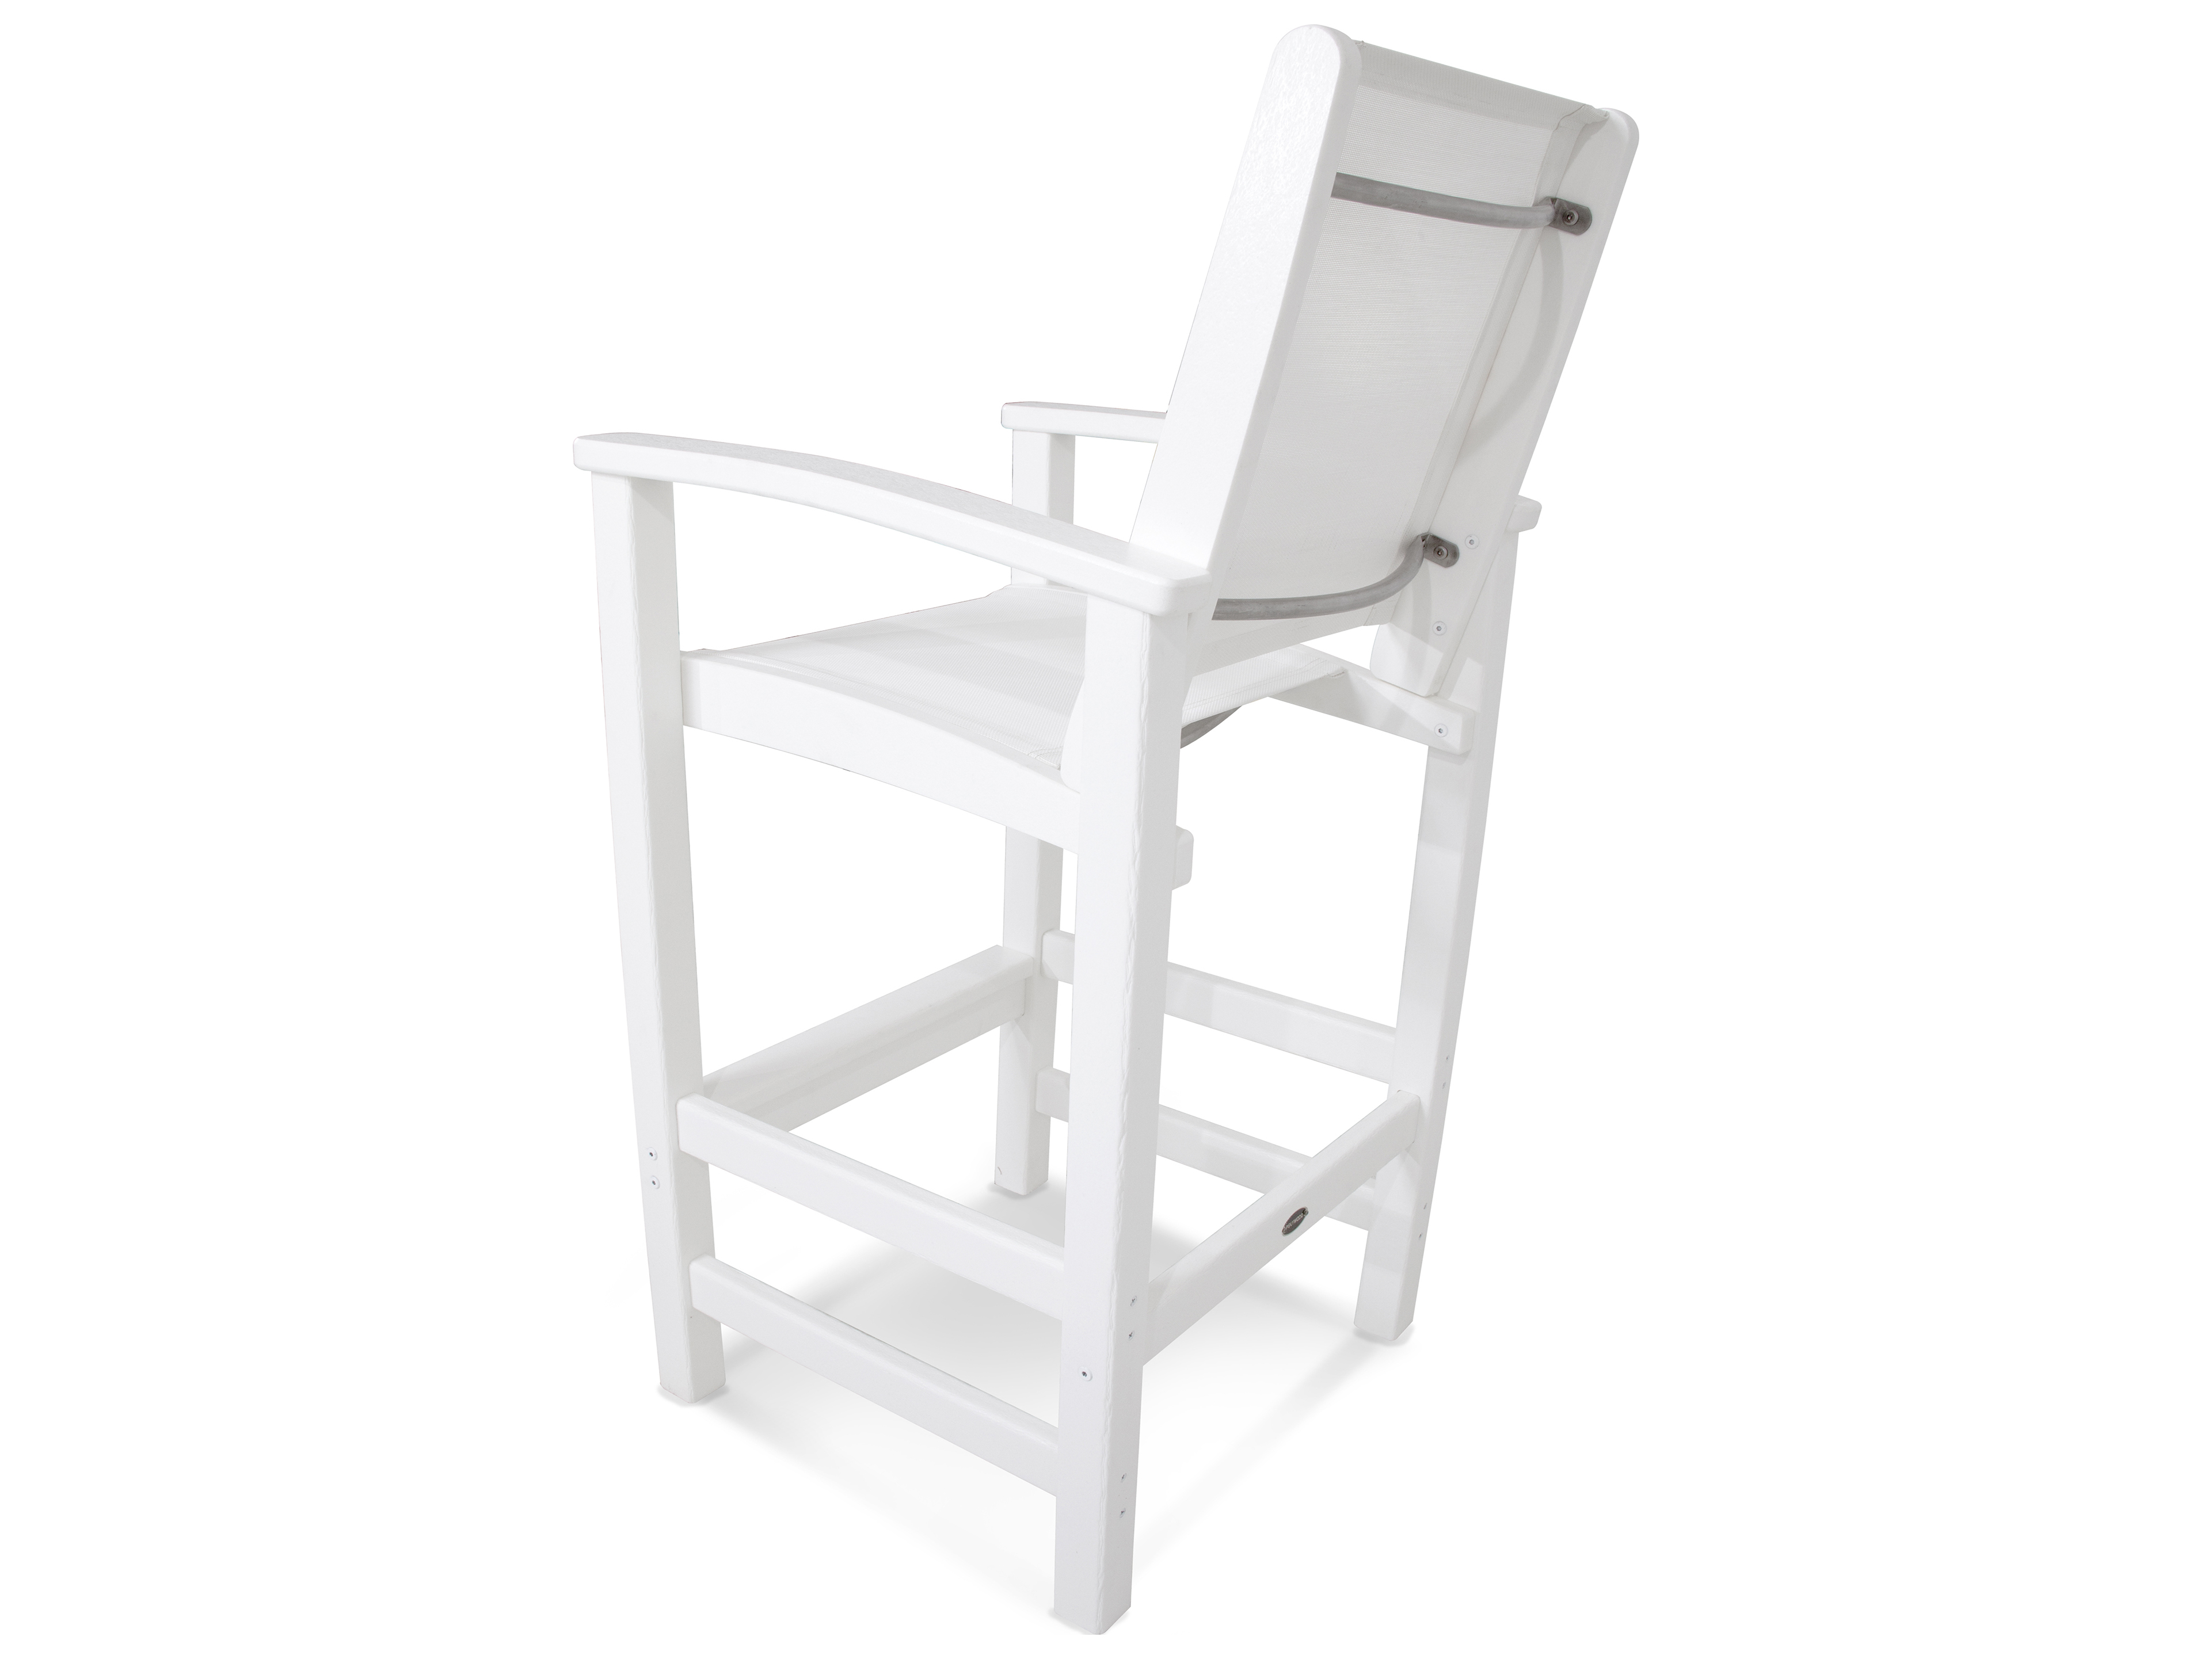 Polywood 174 Coastal Recycled Plastic Bar Chair Pw9012